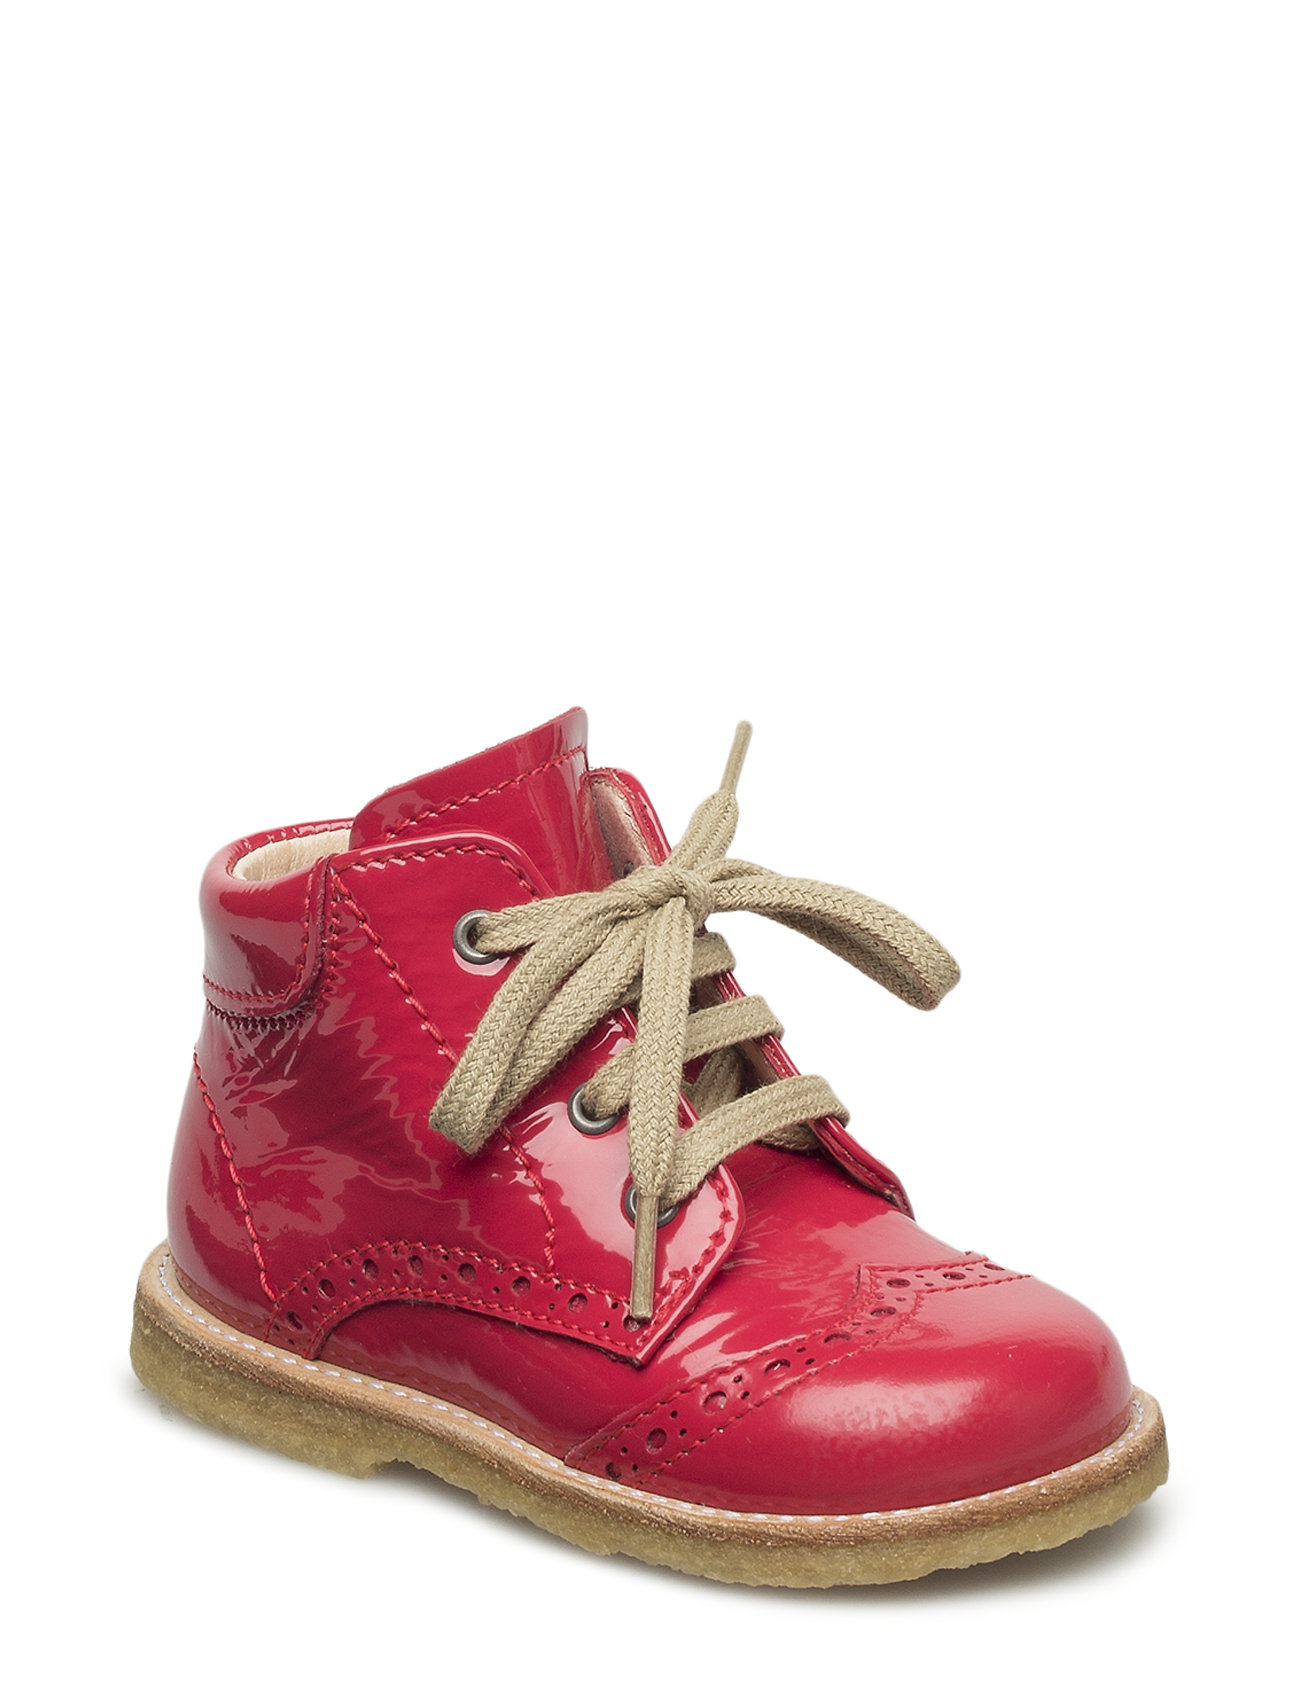 Baby Shoe ANGULUS Sko & Sneakers til Børn i 1325 Champagne